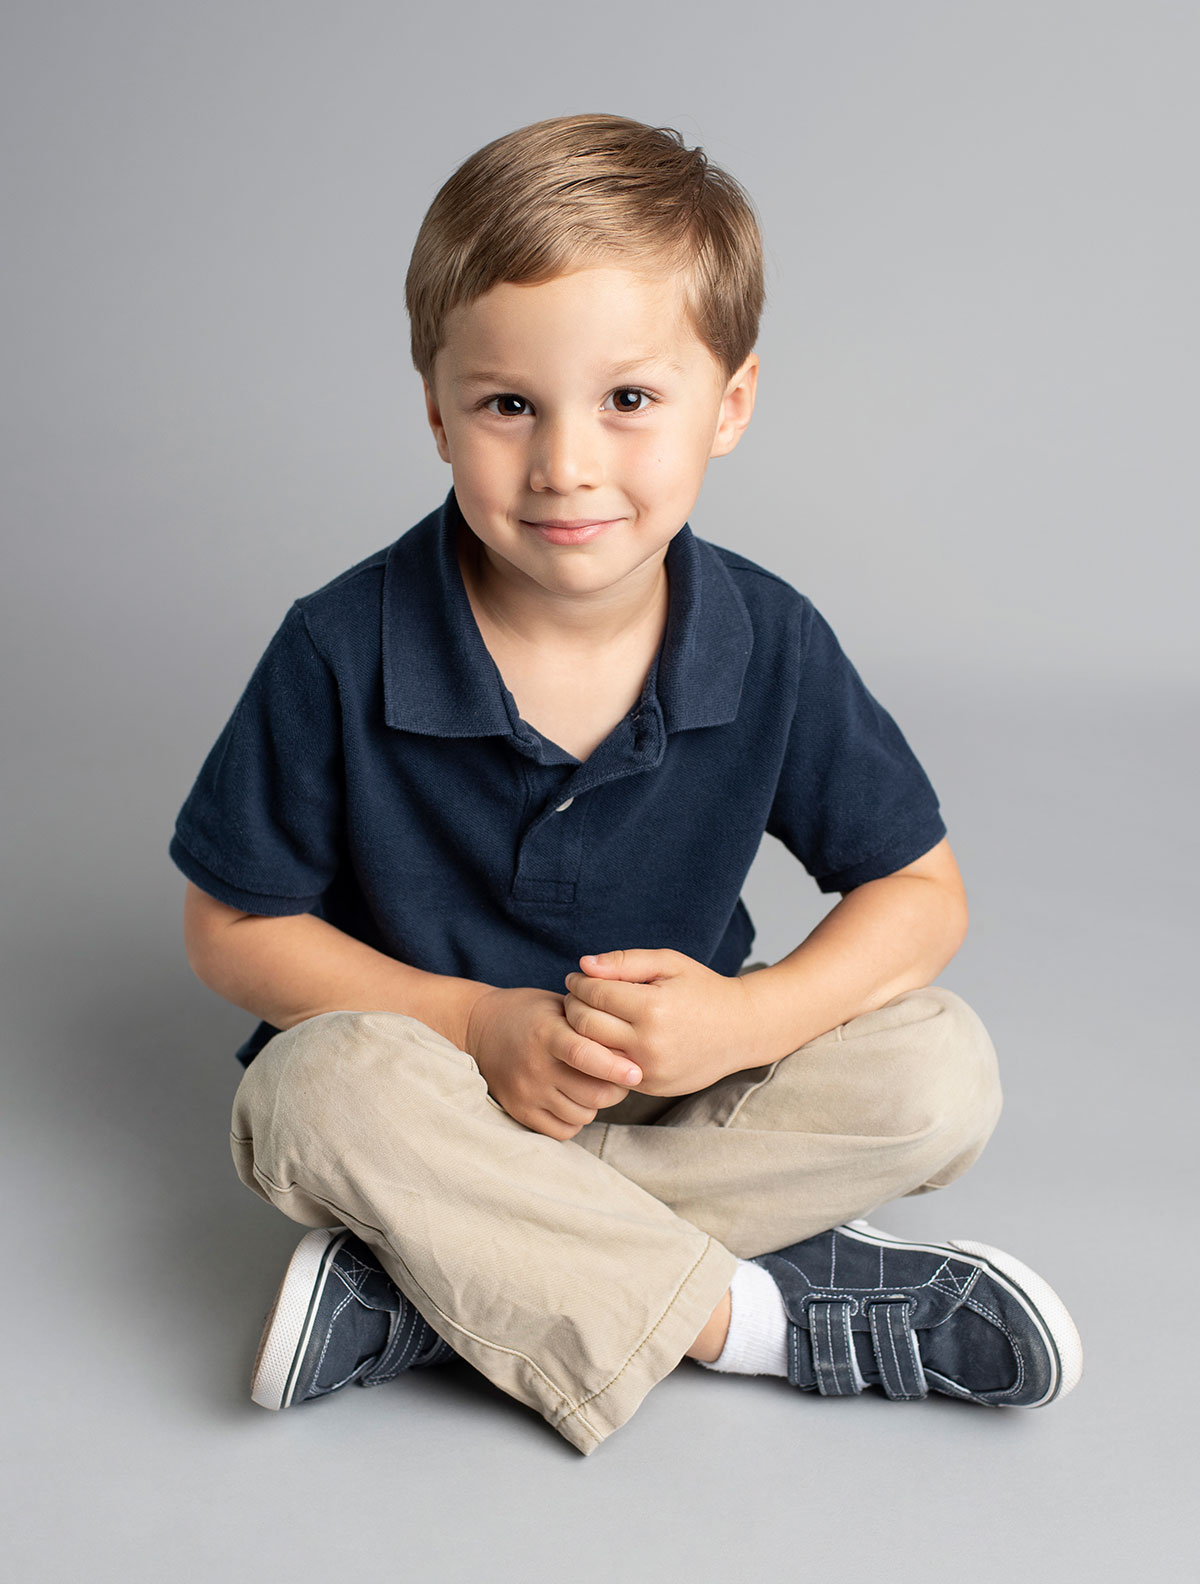 Heights-Preschool-Portraits-08.jpg